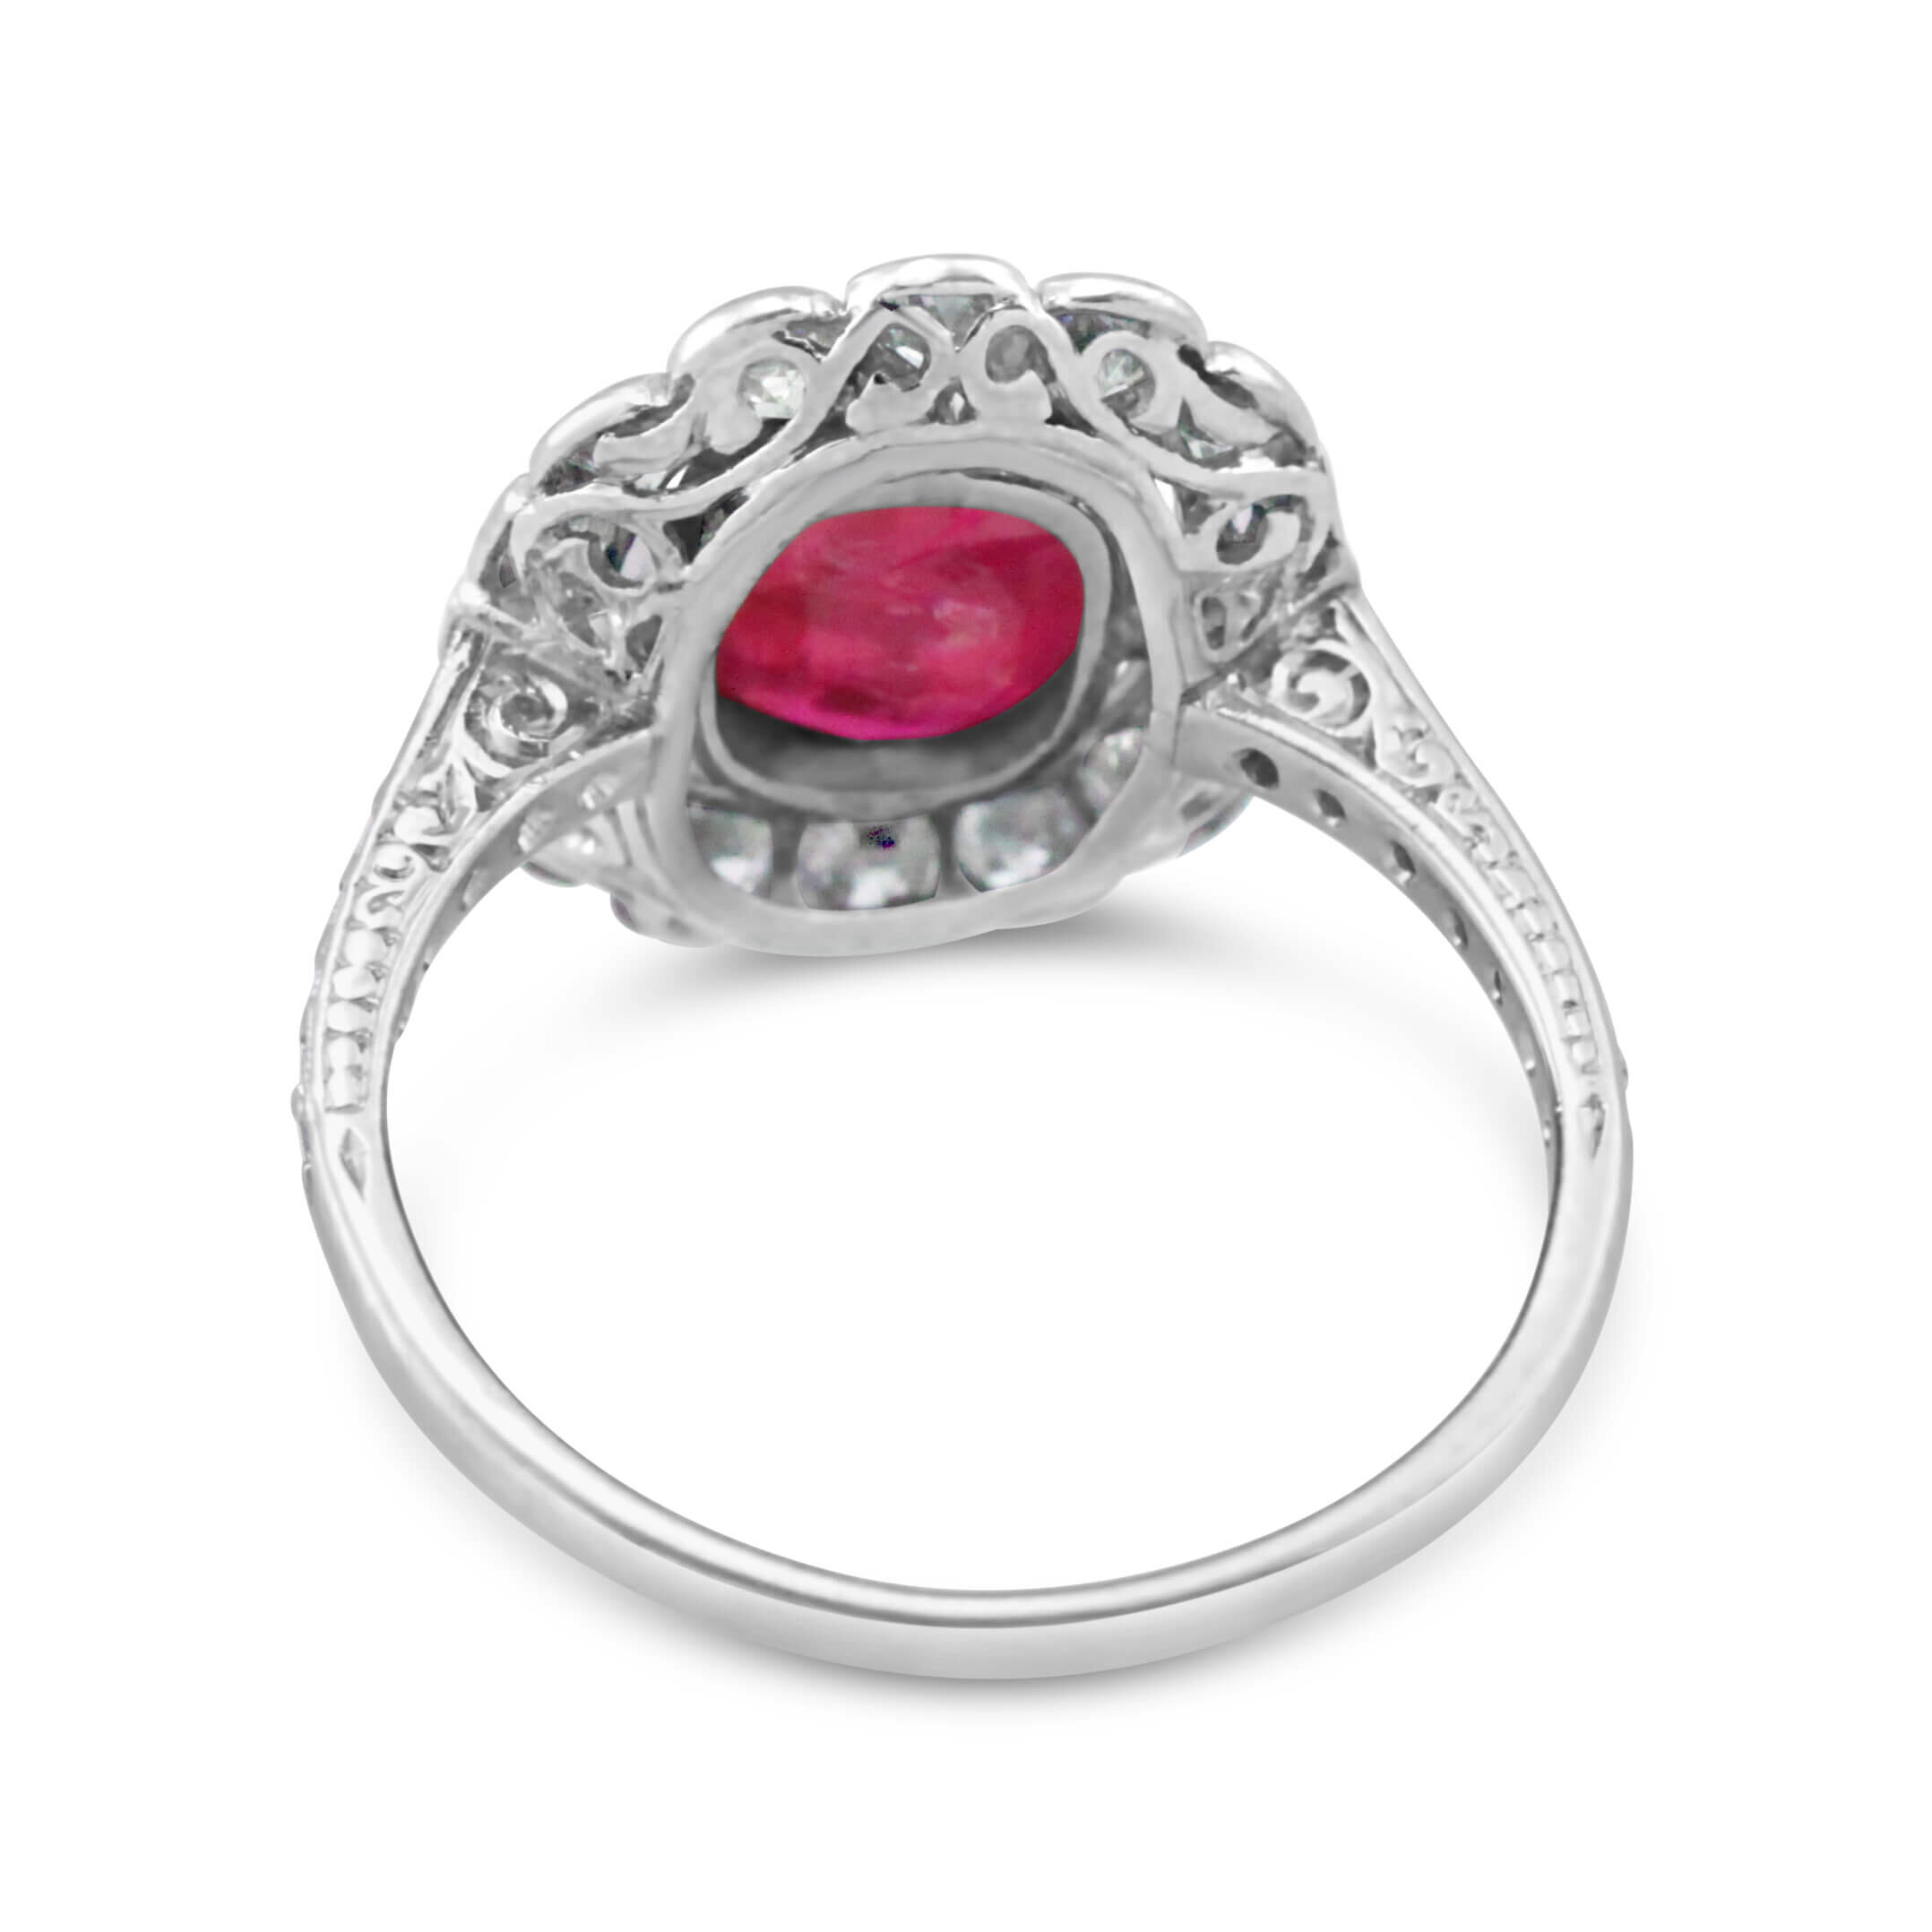 2 ct Unheated Burma Ruby Platinum Ring_back.jpg